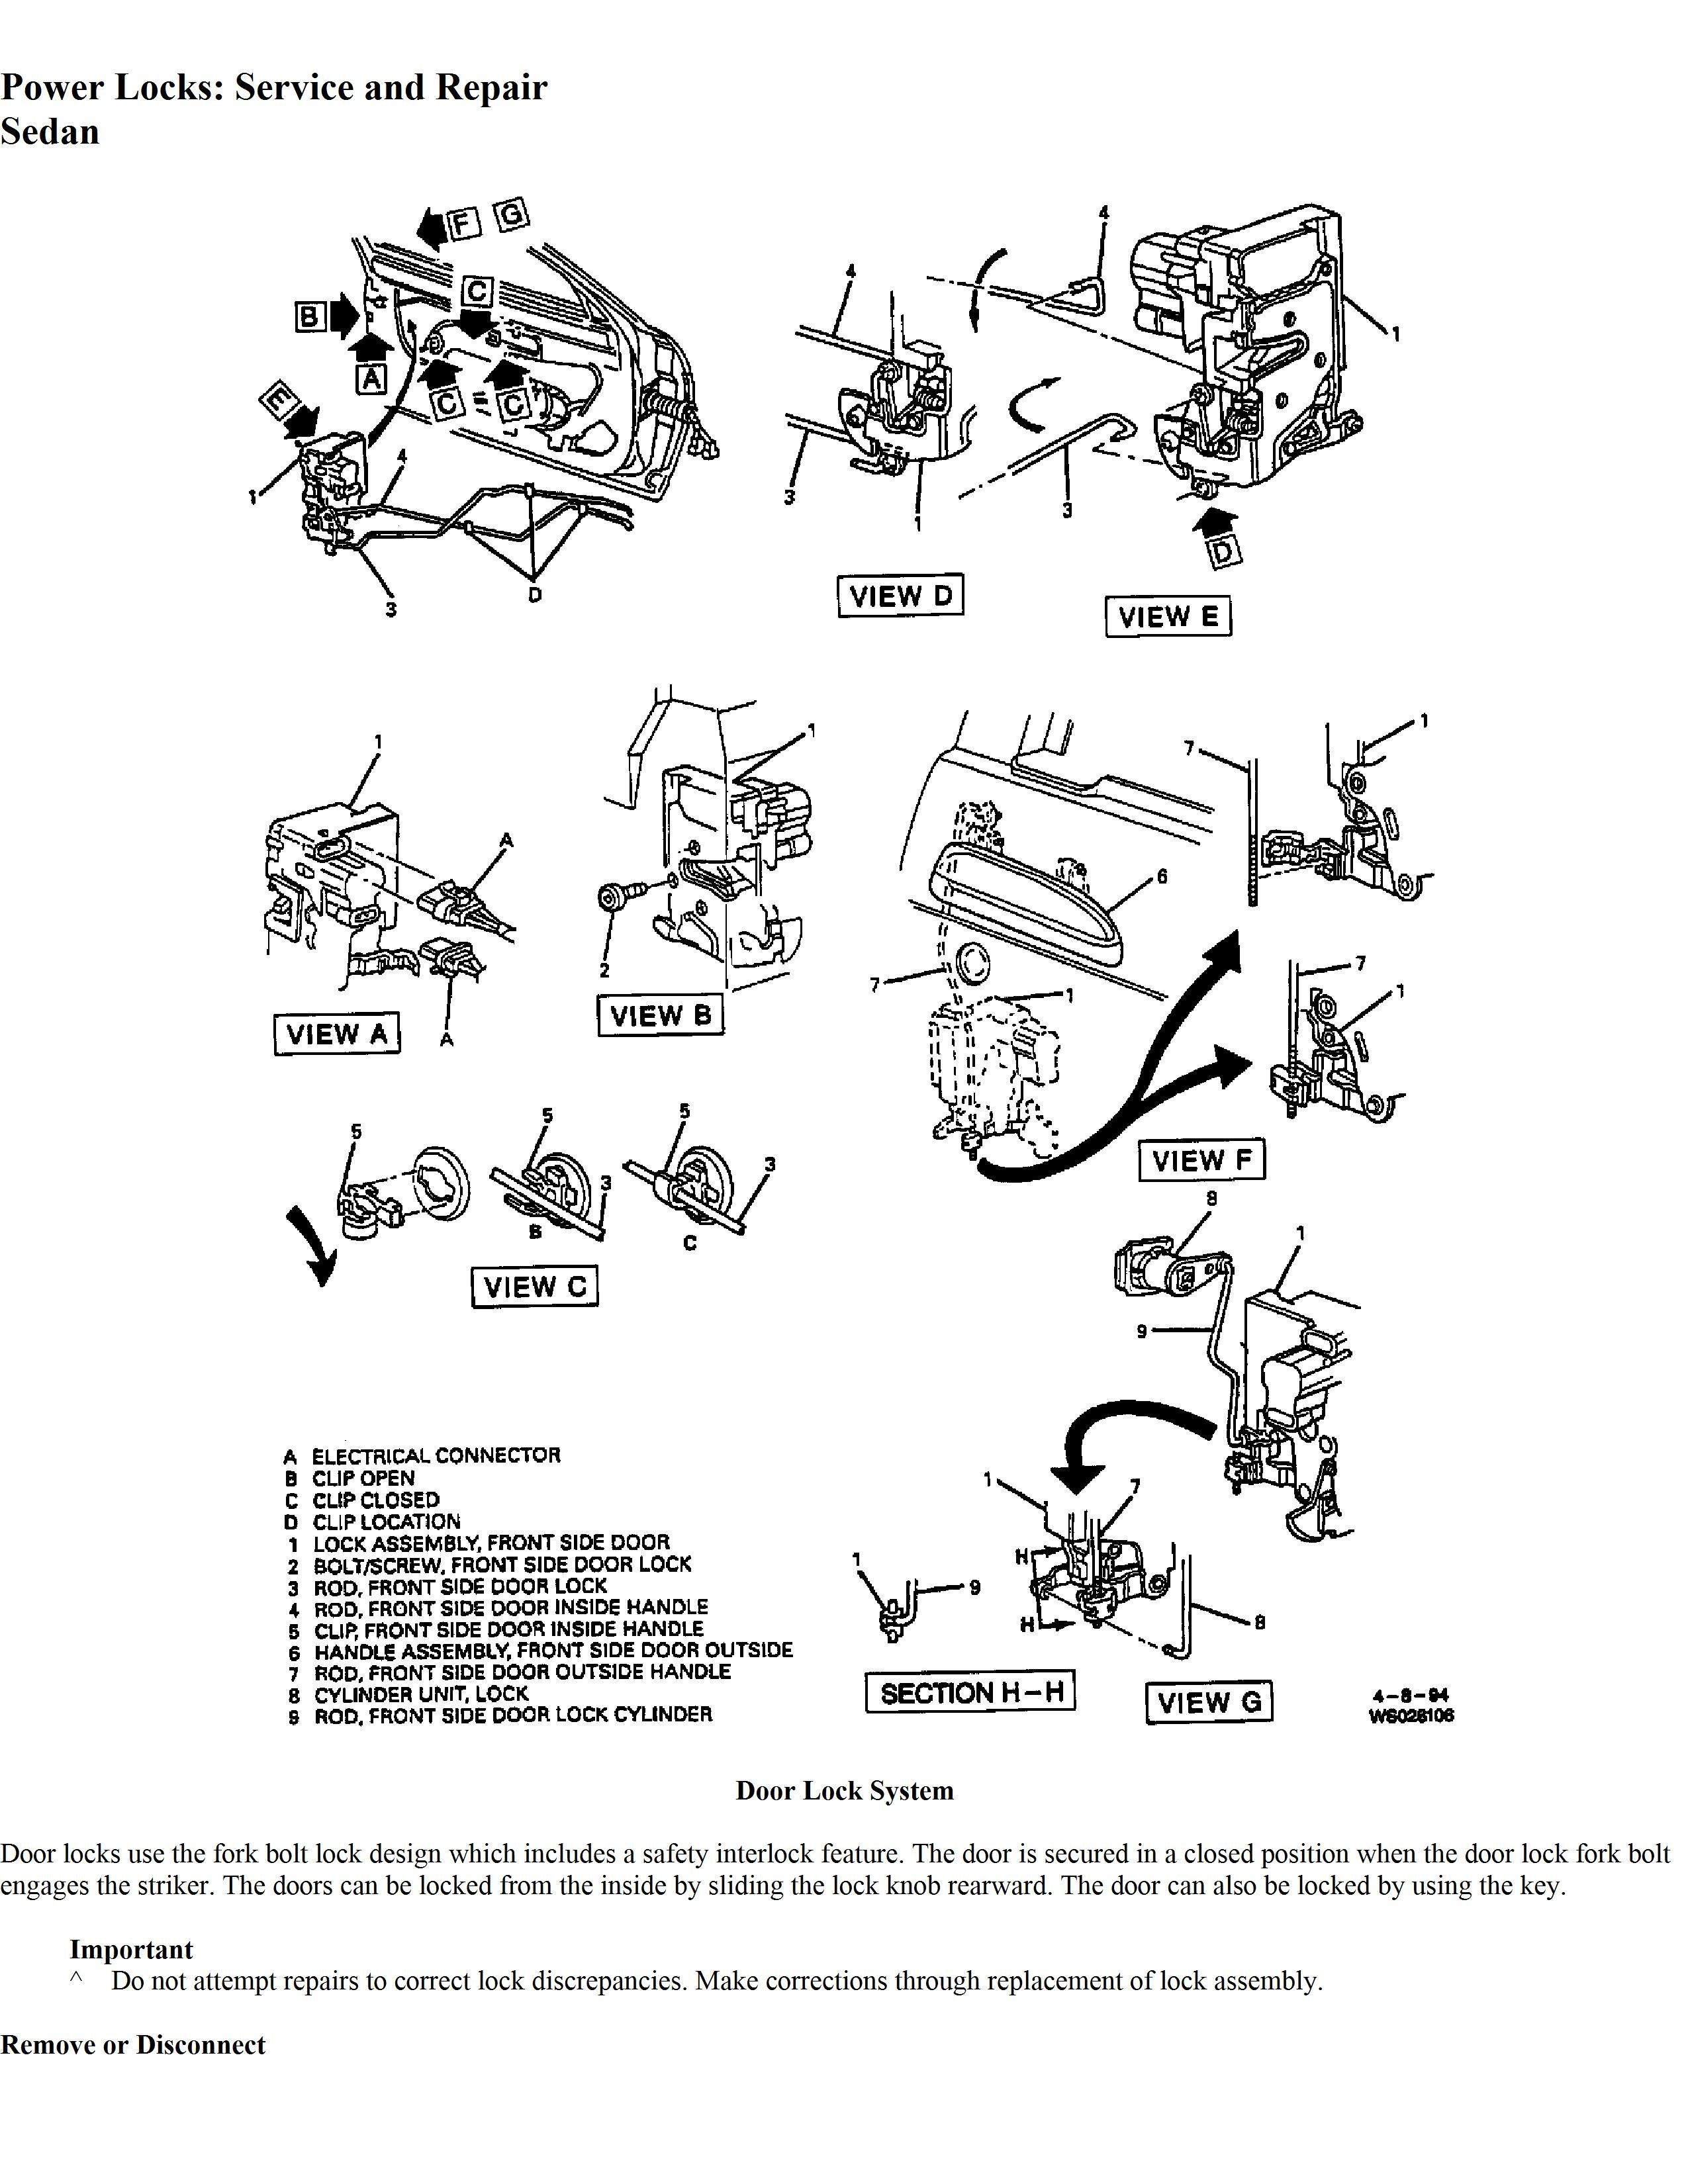 chevy lumina door lock wiring diagram free download wiring diagrams for a 96  lumina under hood